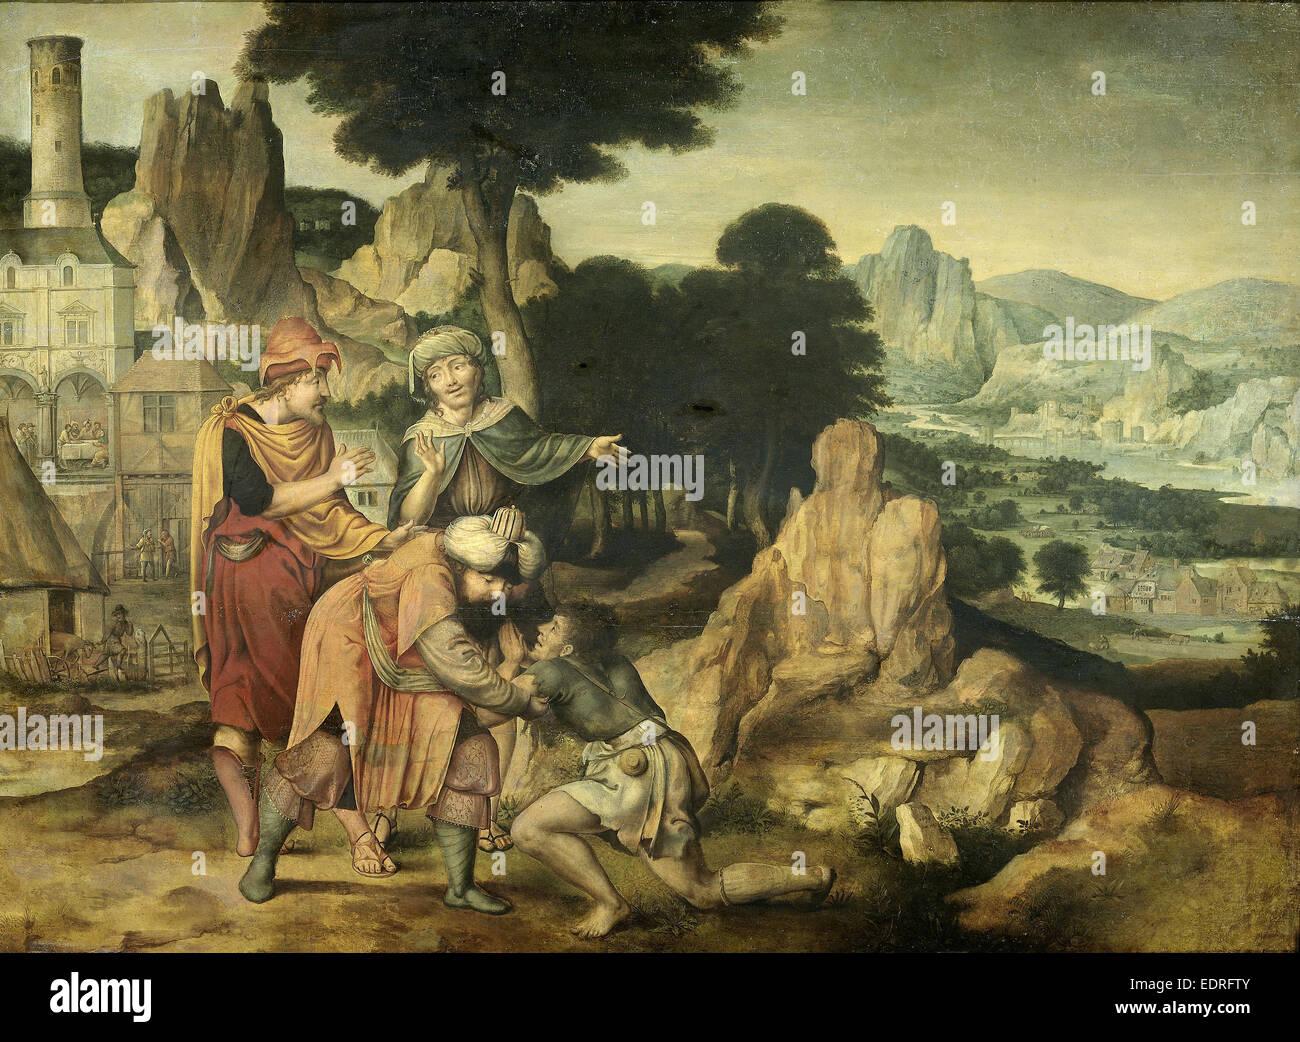 Parable of the Prodigal Son, Cornelis Massijs, 1538 - Stock Image